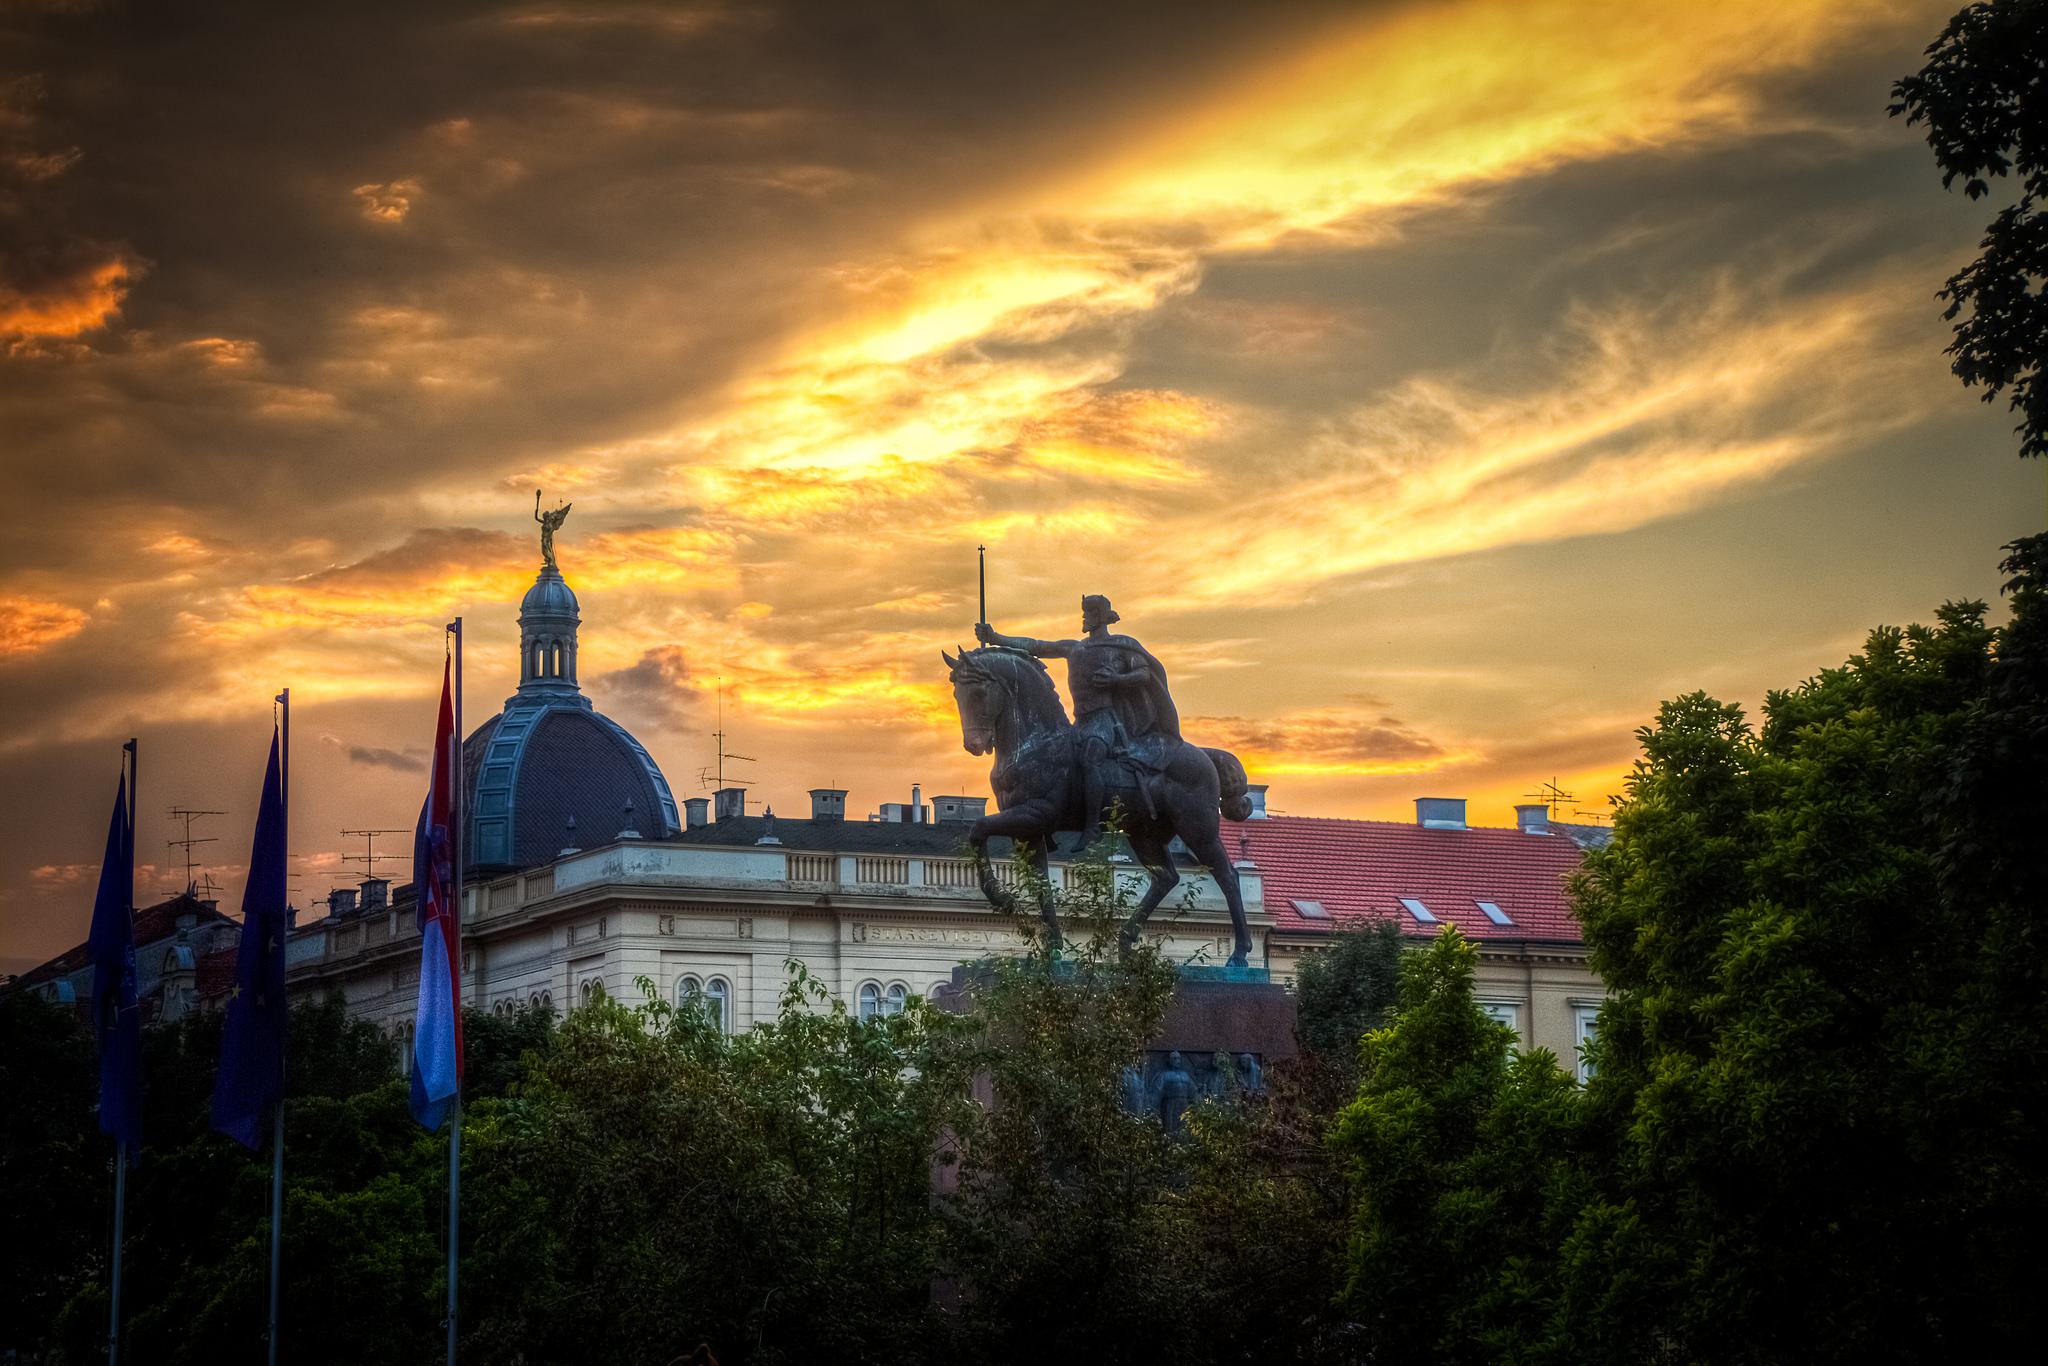 Tomislav, King of Croatia